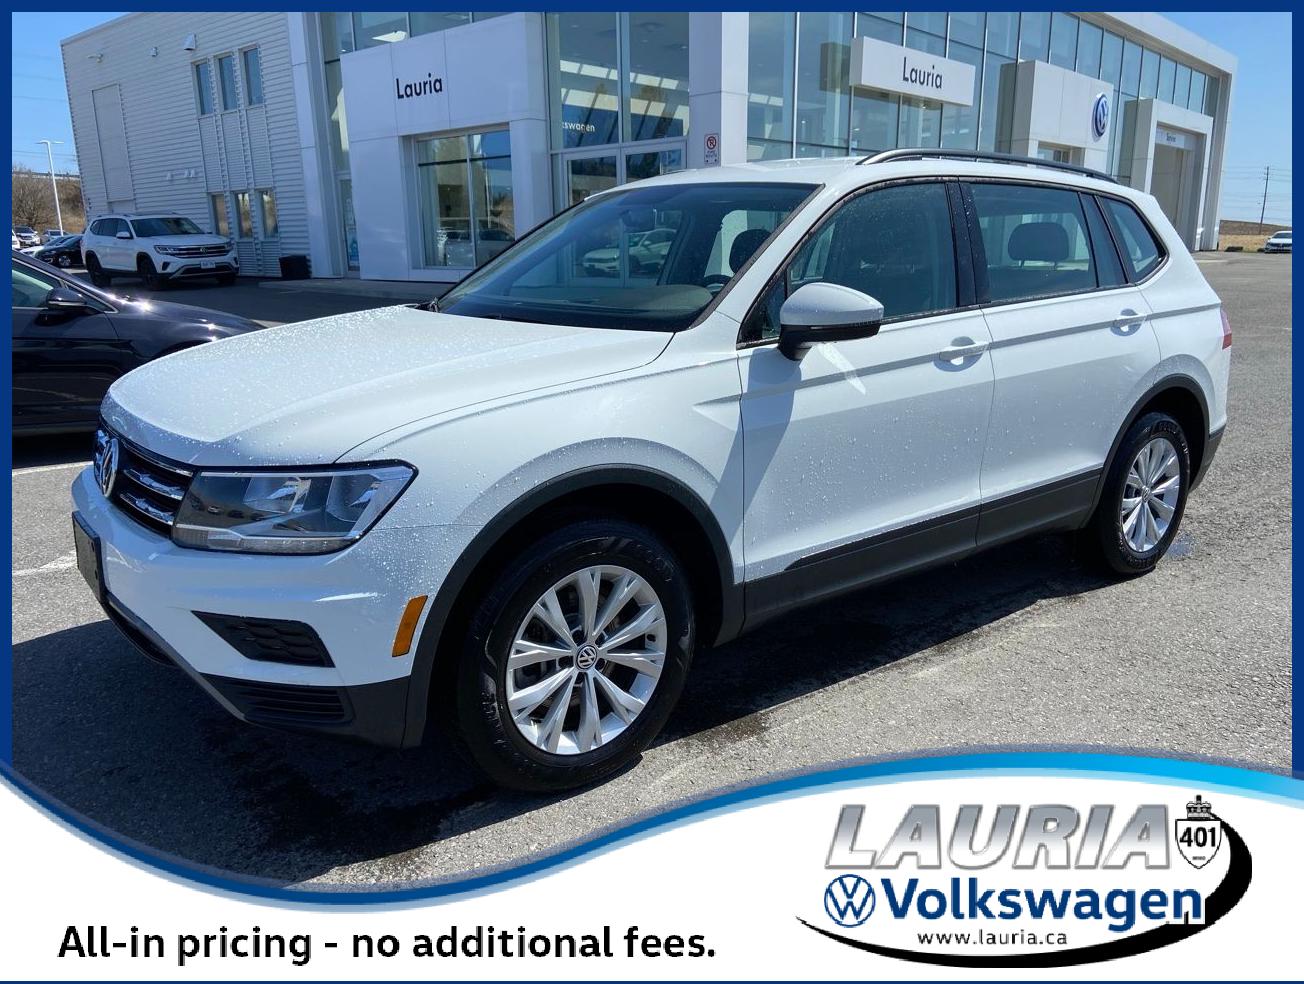 used 2020 Volkswagen Tiguan car, priced at $28,388